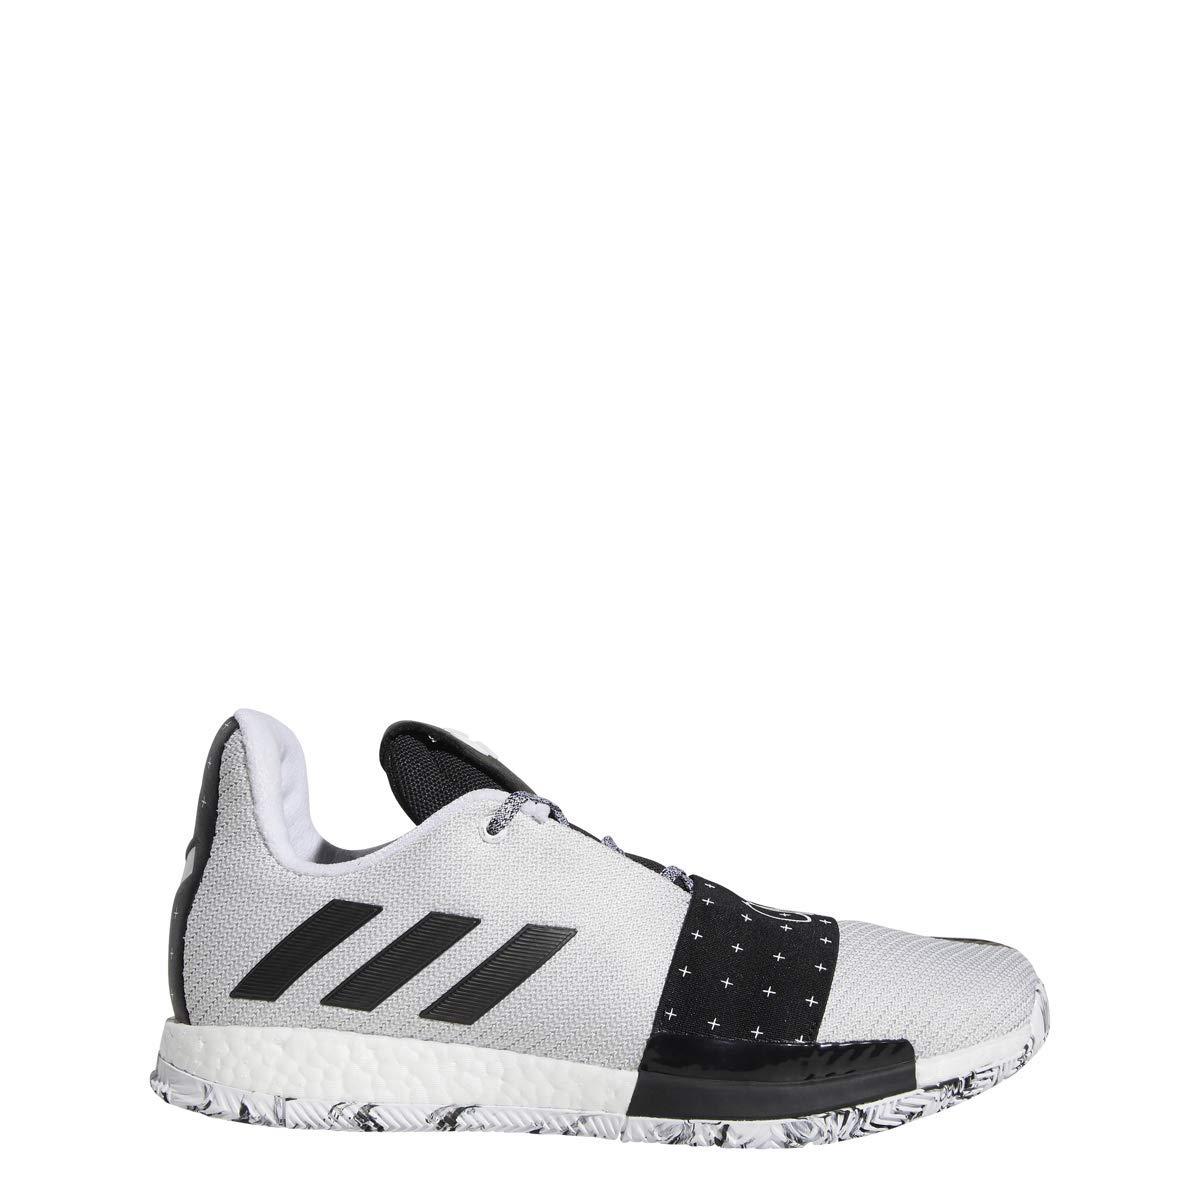 pretty nice 571c7 24d40 Amazon.com   adidas Mens Harden Vol.3 Boost Basketball Shoes   Basketball